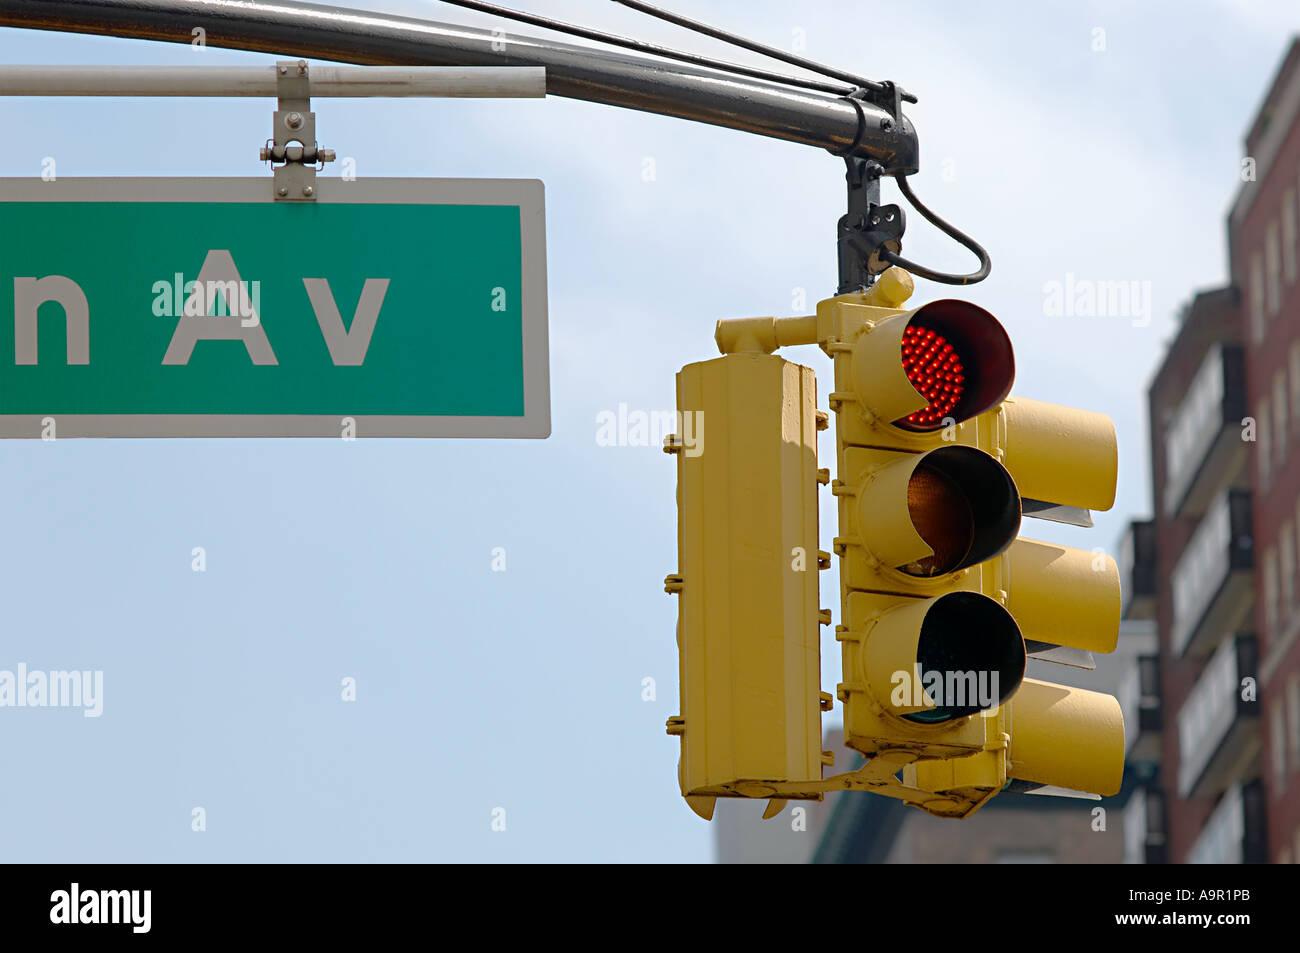 New york traffic lights - Stock Image